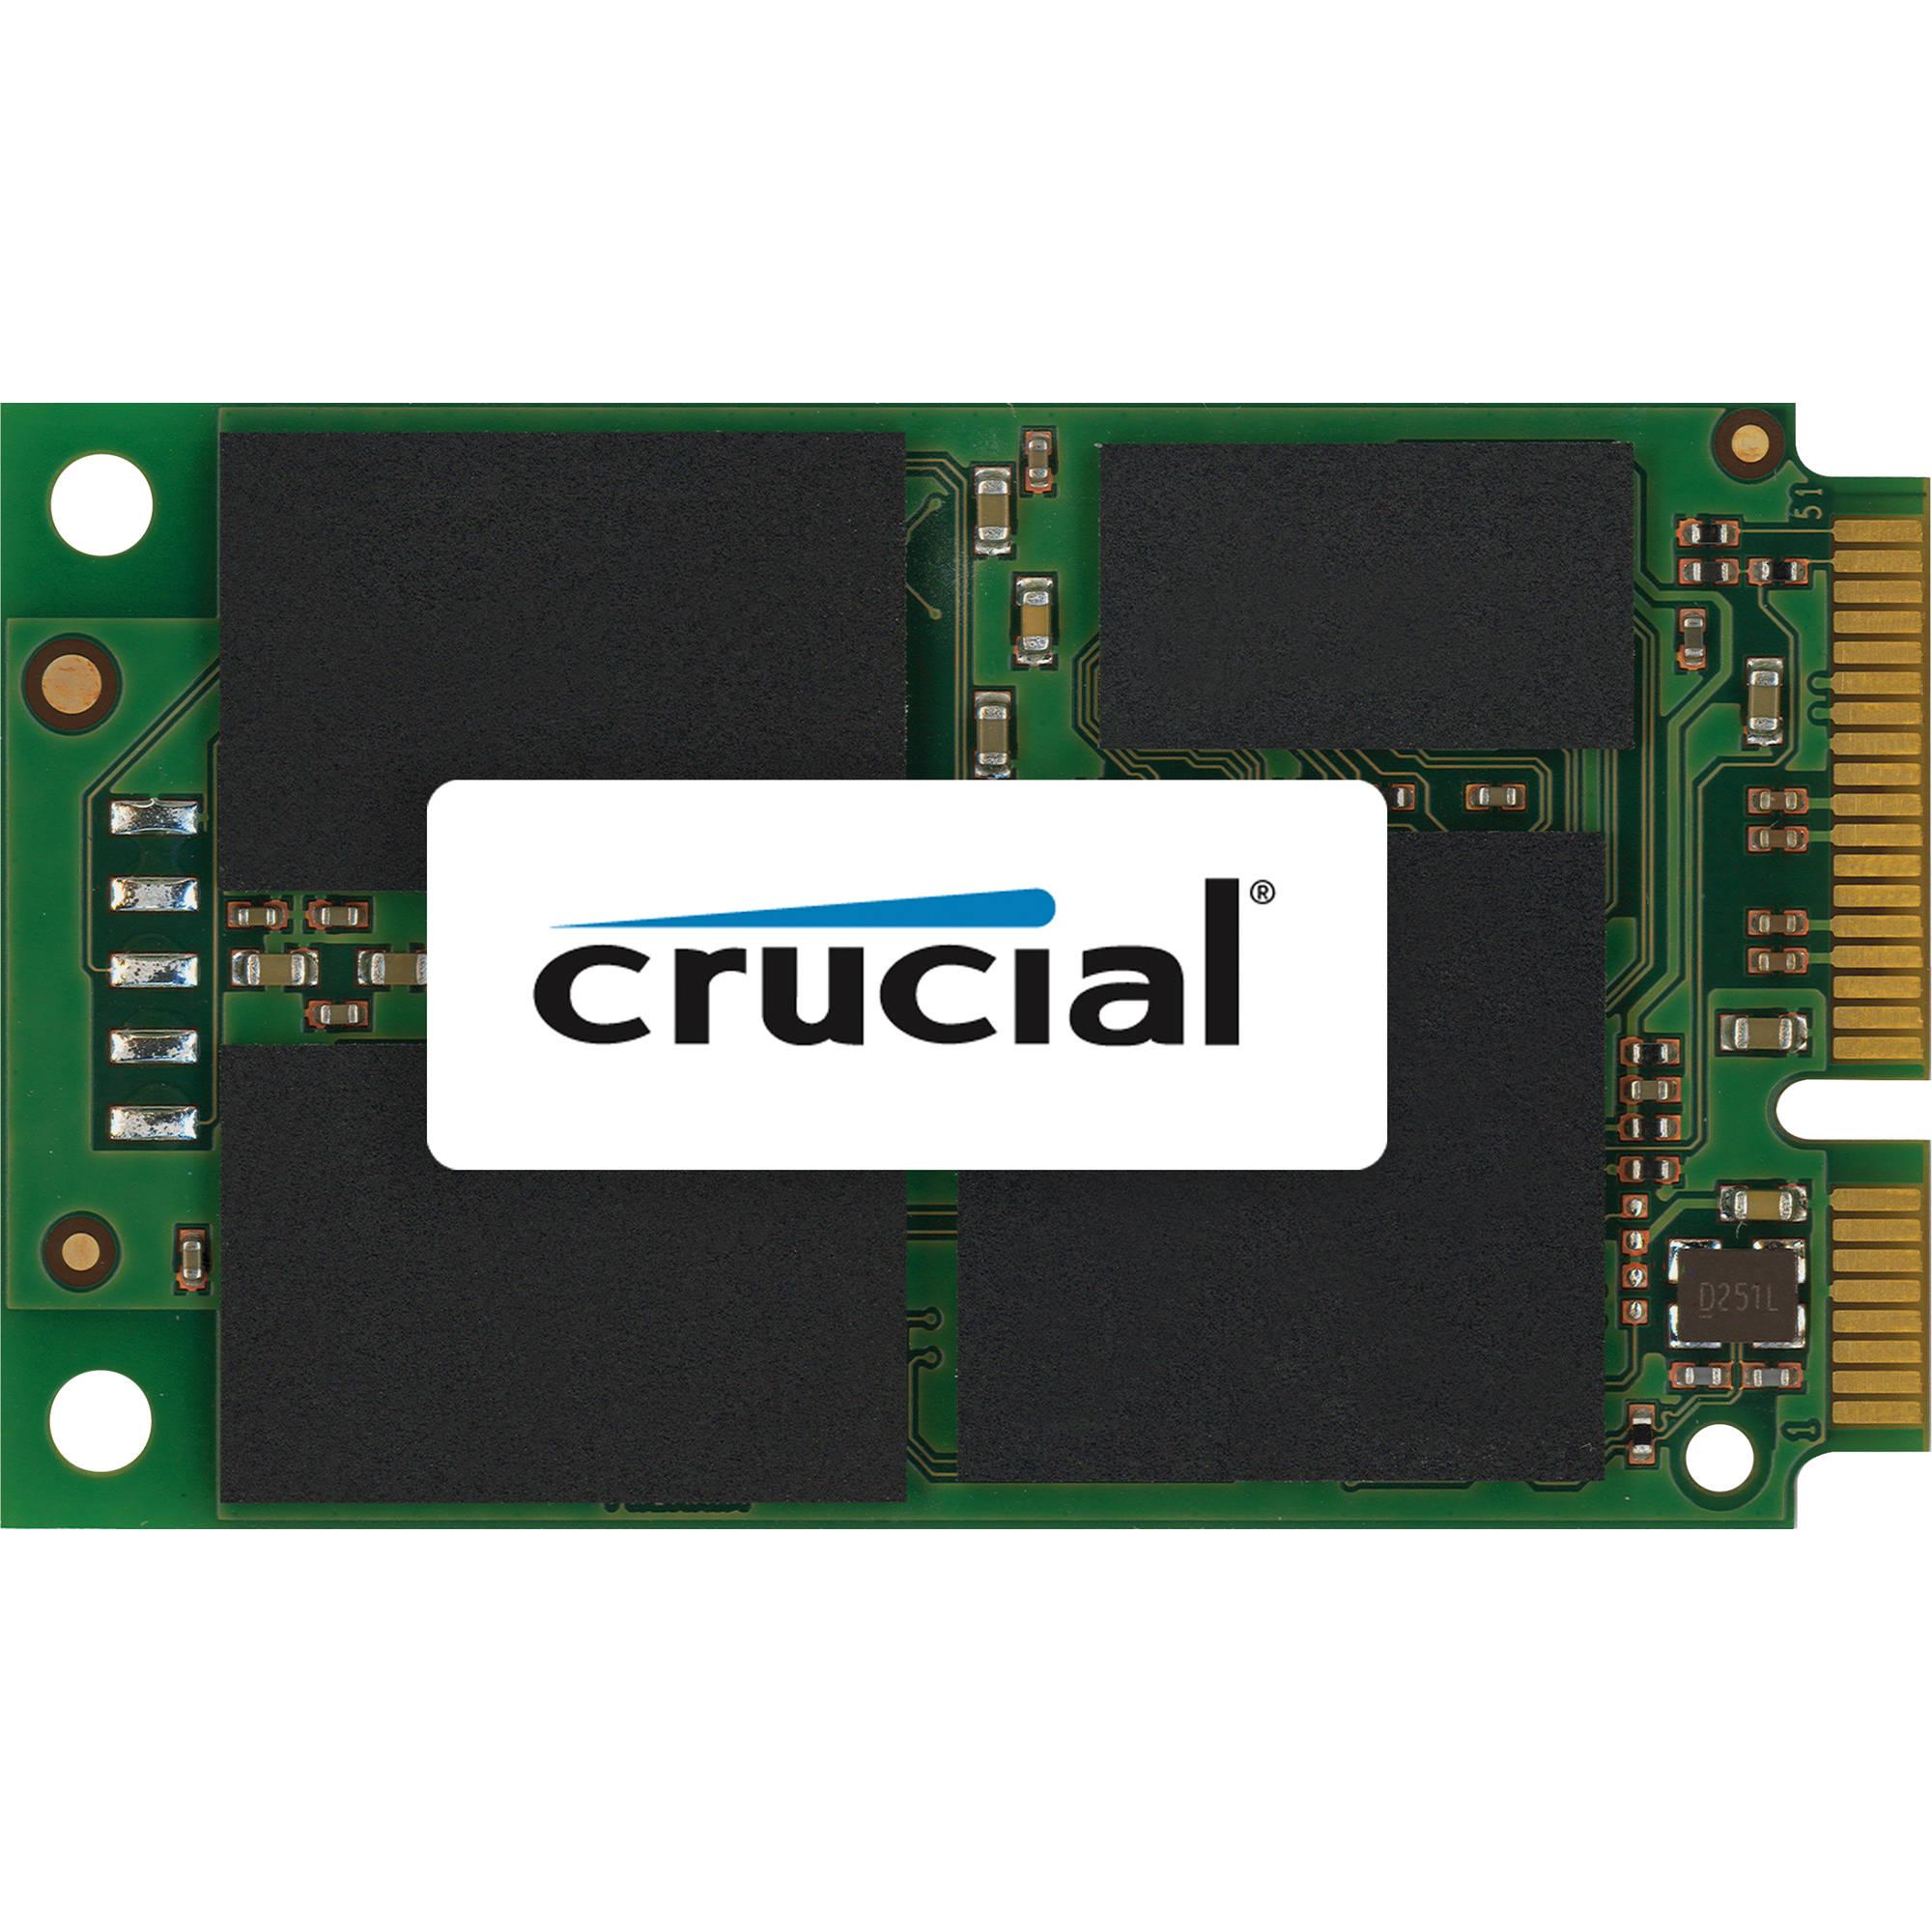 Crucial 256GB m4 mSATA 6Gb/s Solid State Drive CT256M4SSD3 B&H